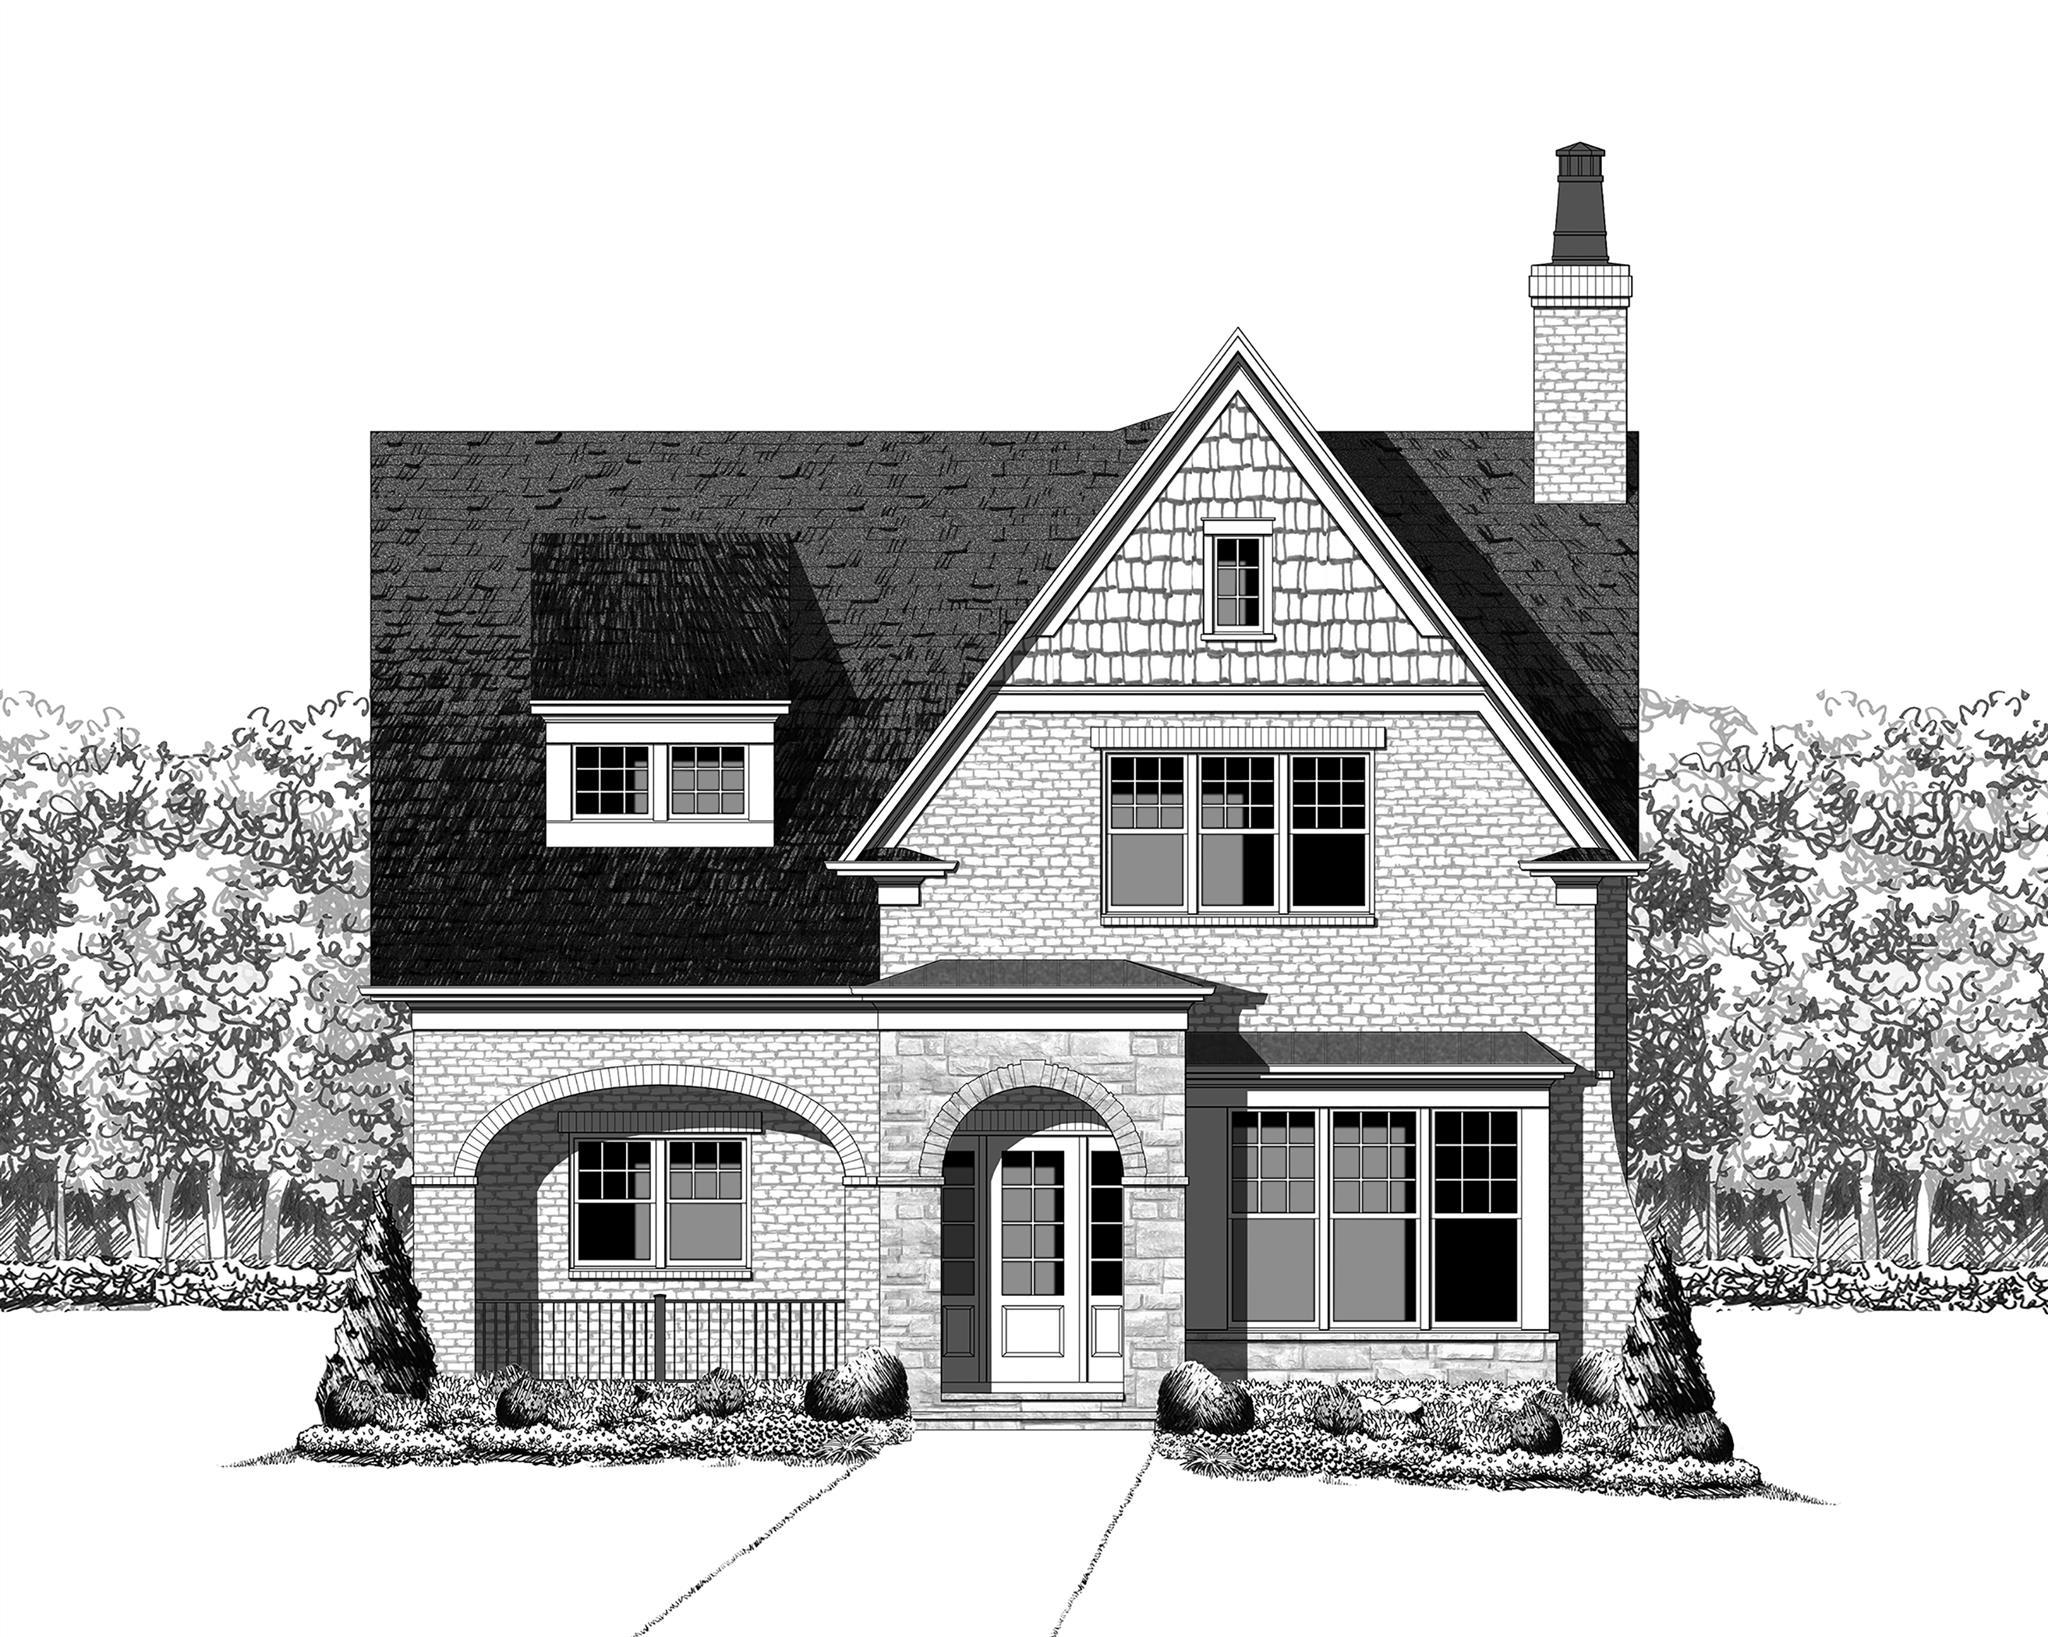 3534 RICHLAND AVE. (#3534), Nashville, TN 37205 - Nashville, TN real estate listing